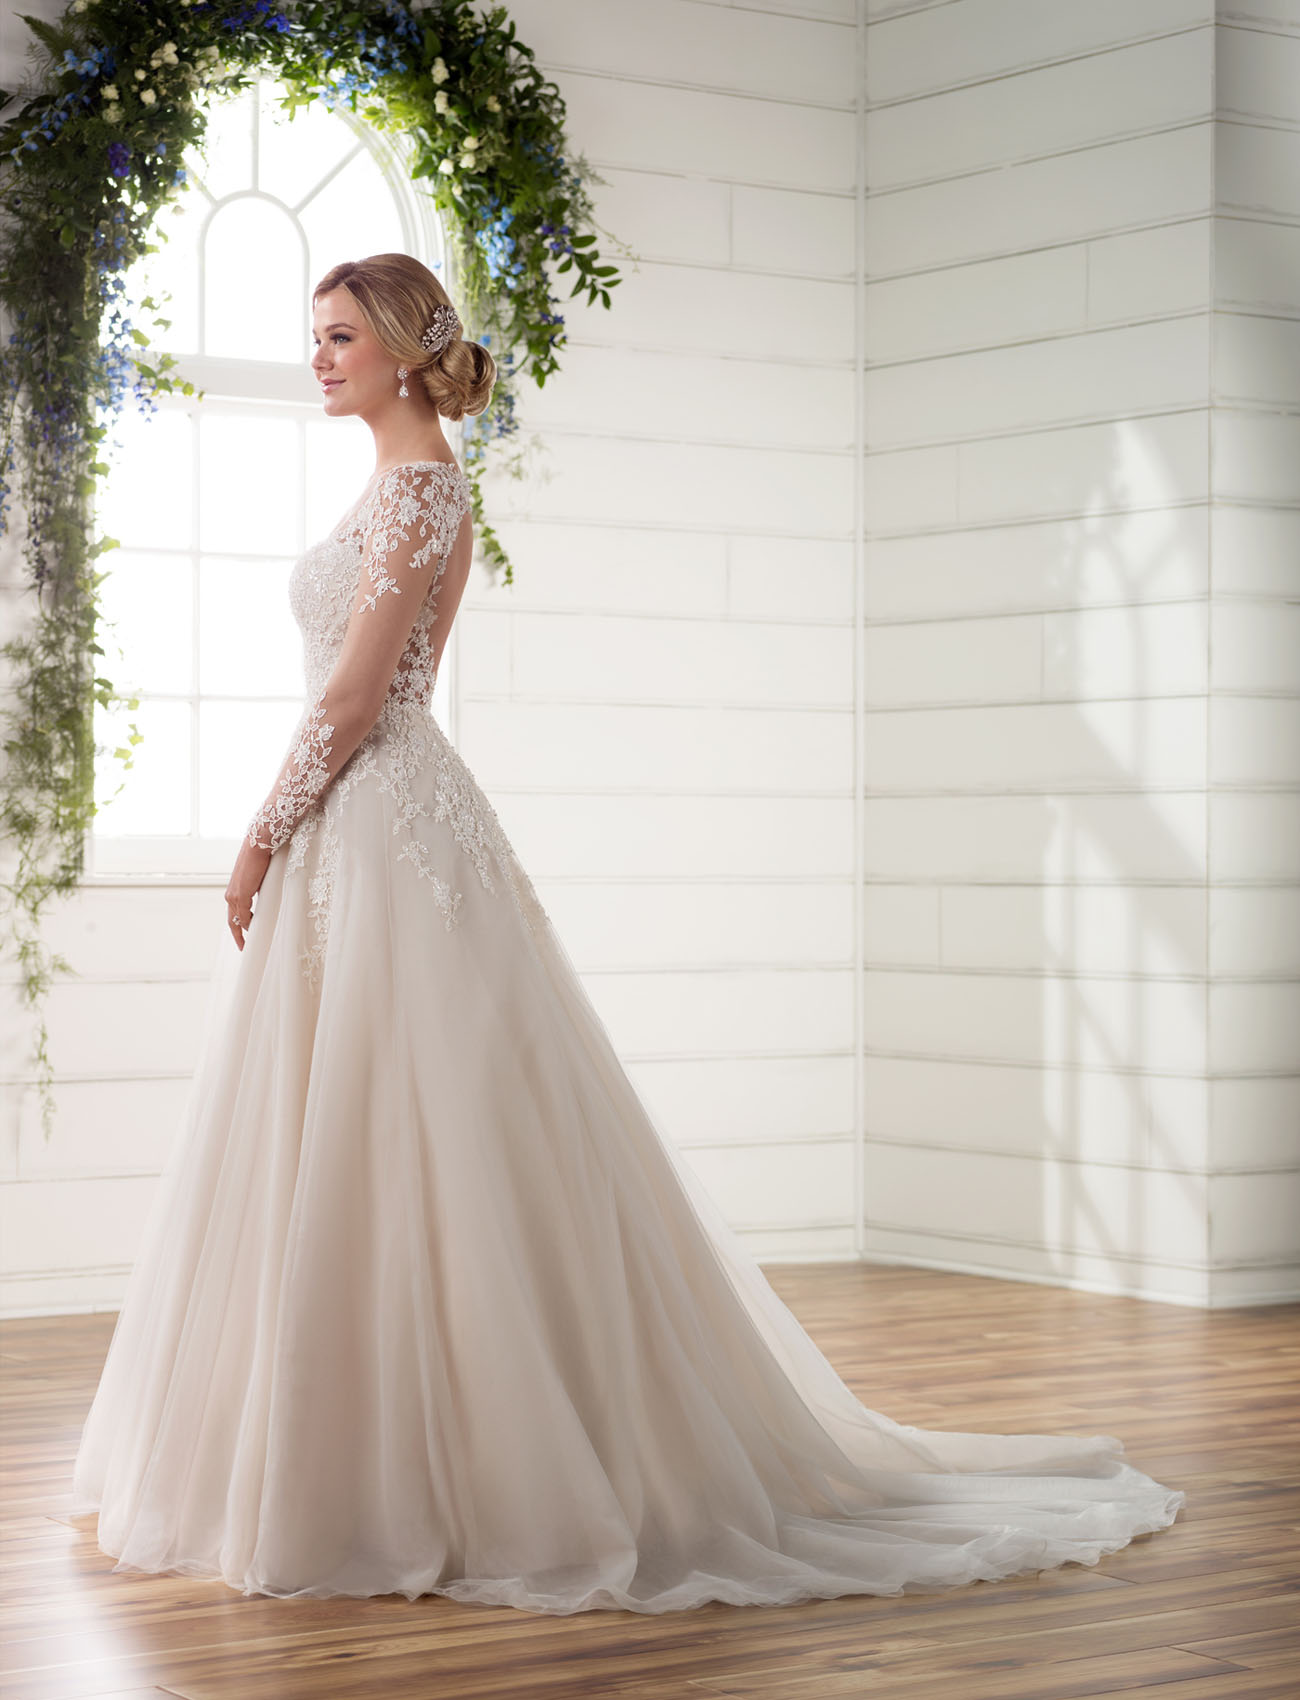 Romantic Wedding Dresses 57 Amazing Essencse of Australia